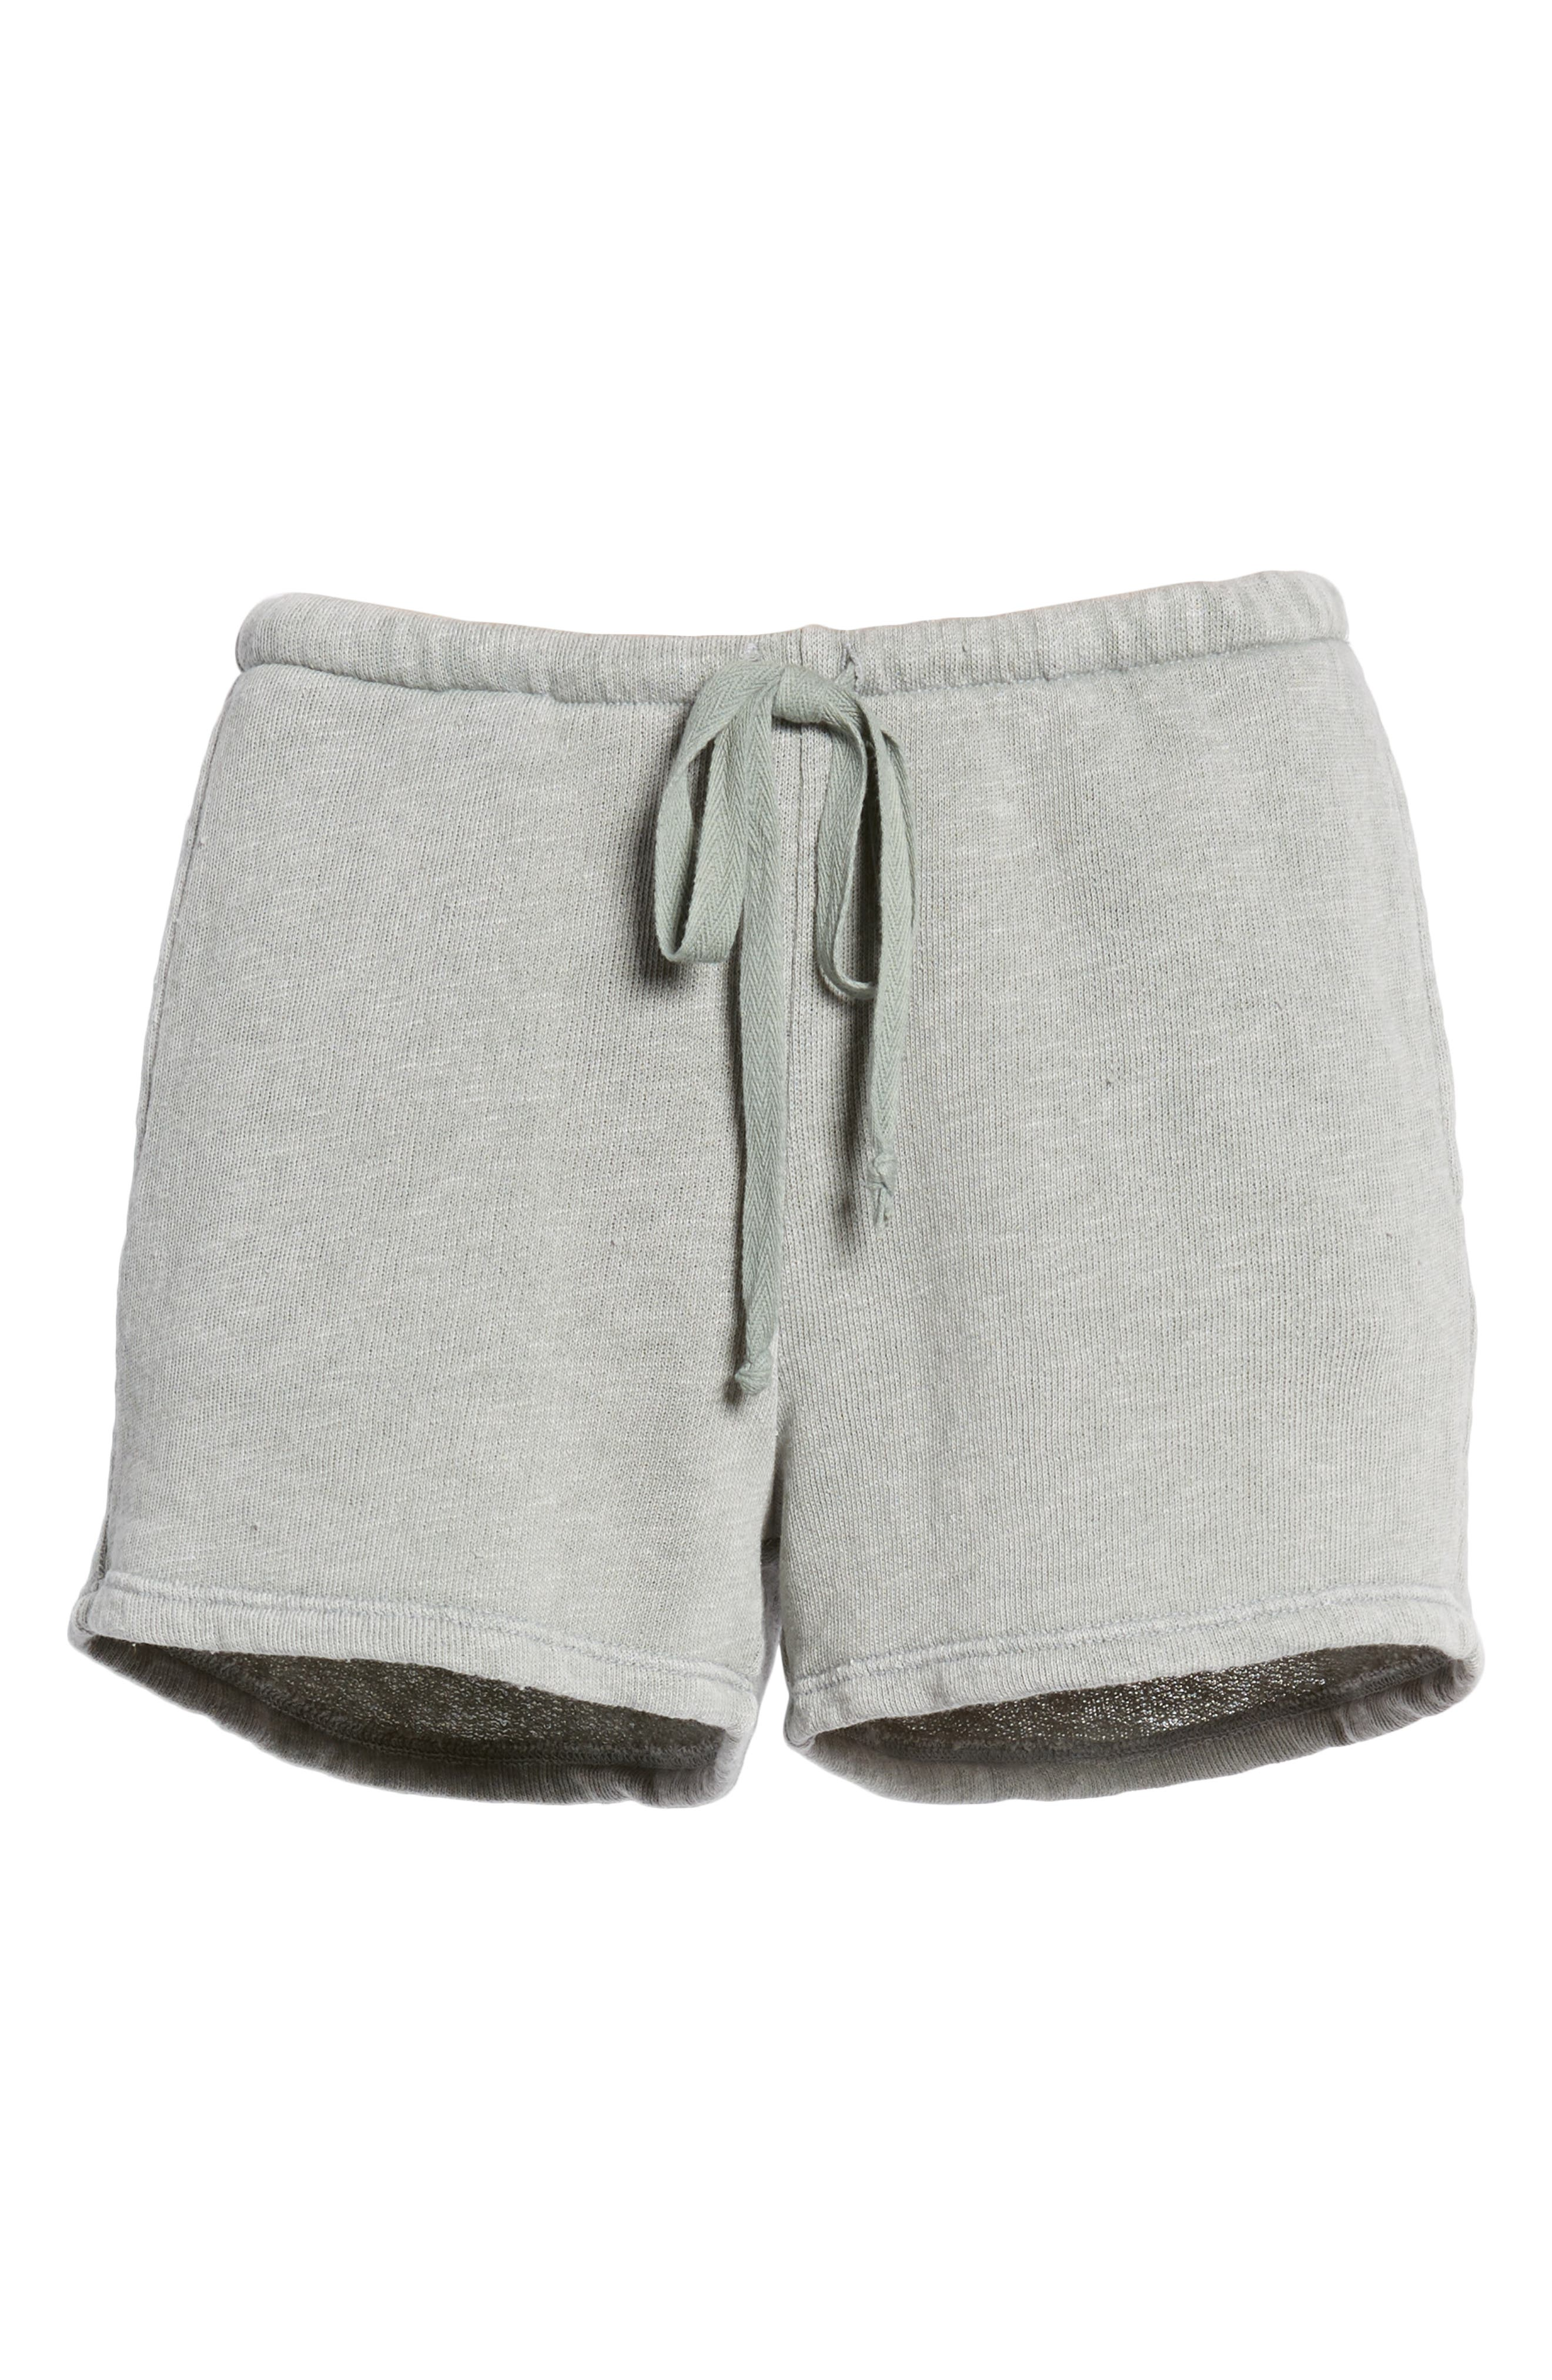 Kiama Shorts,                             Alternate thumbnail 6, color,                             FADED MOSS